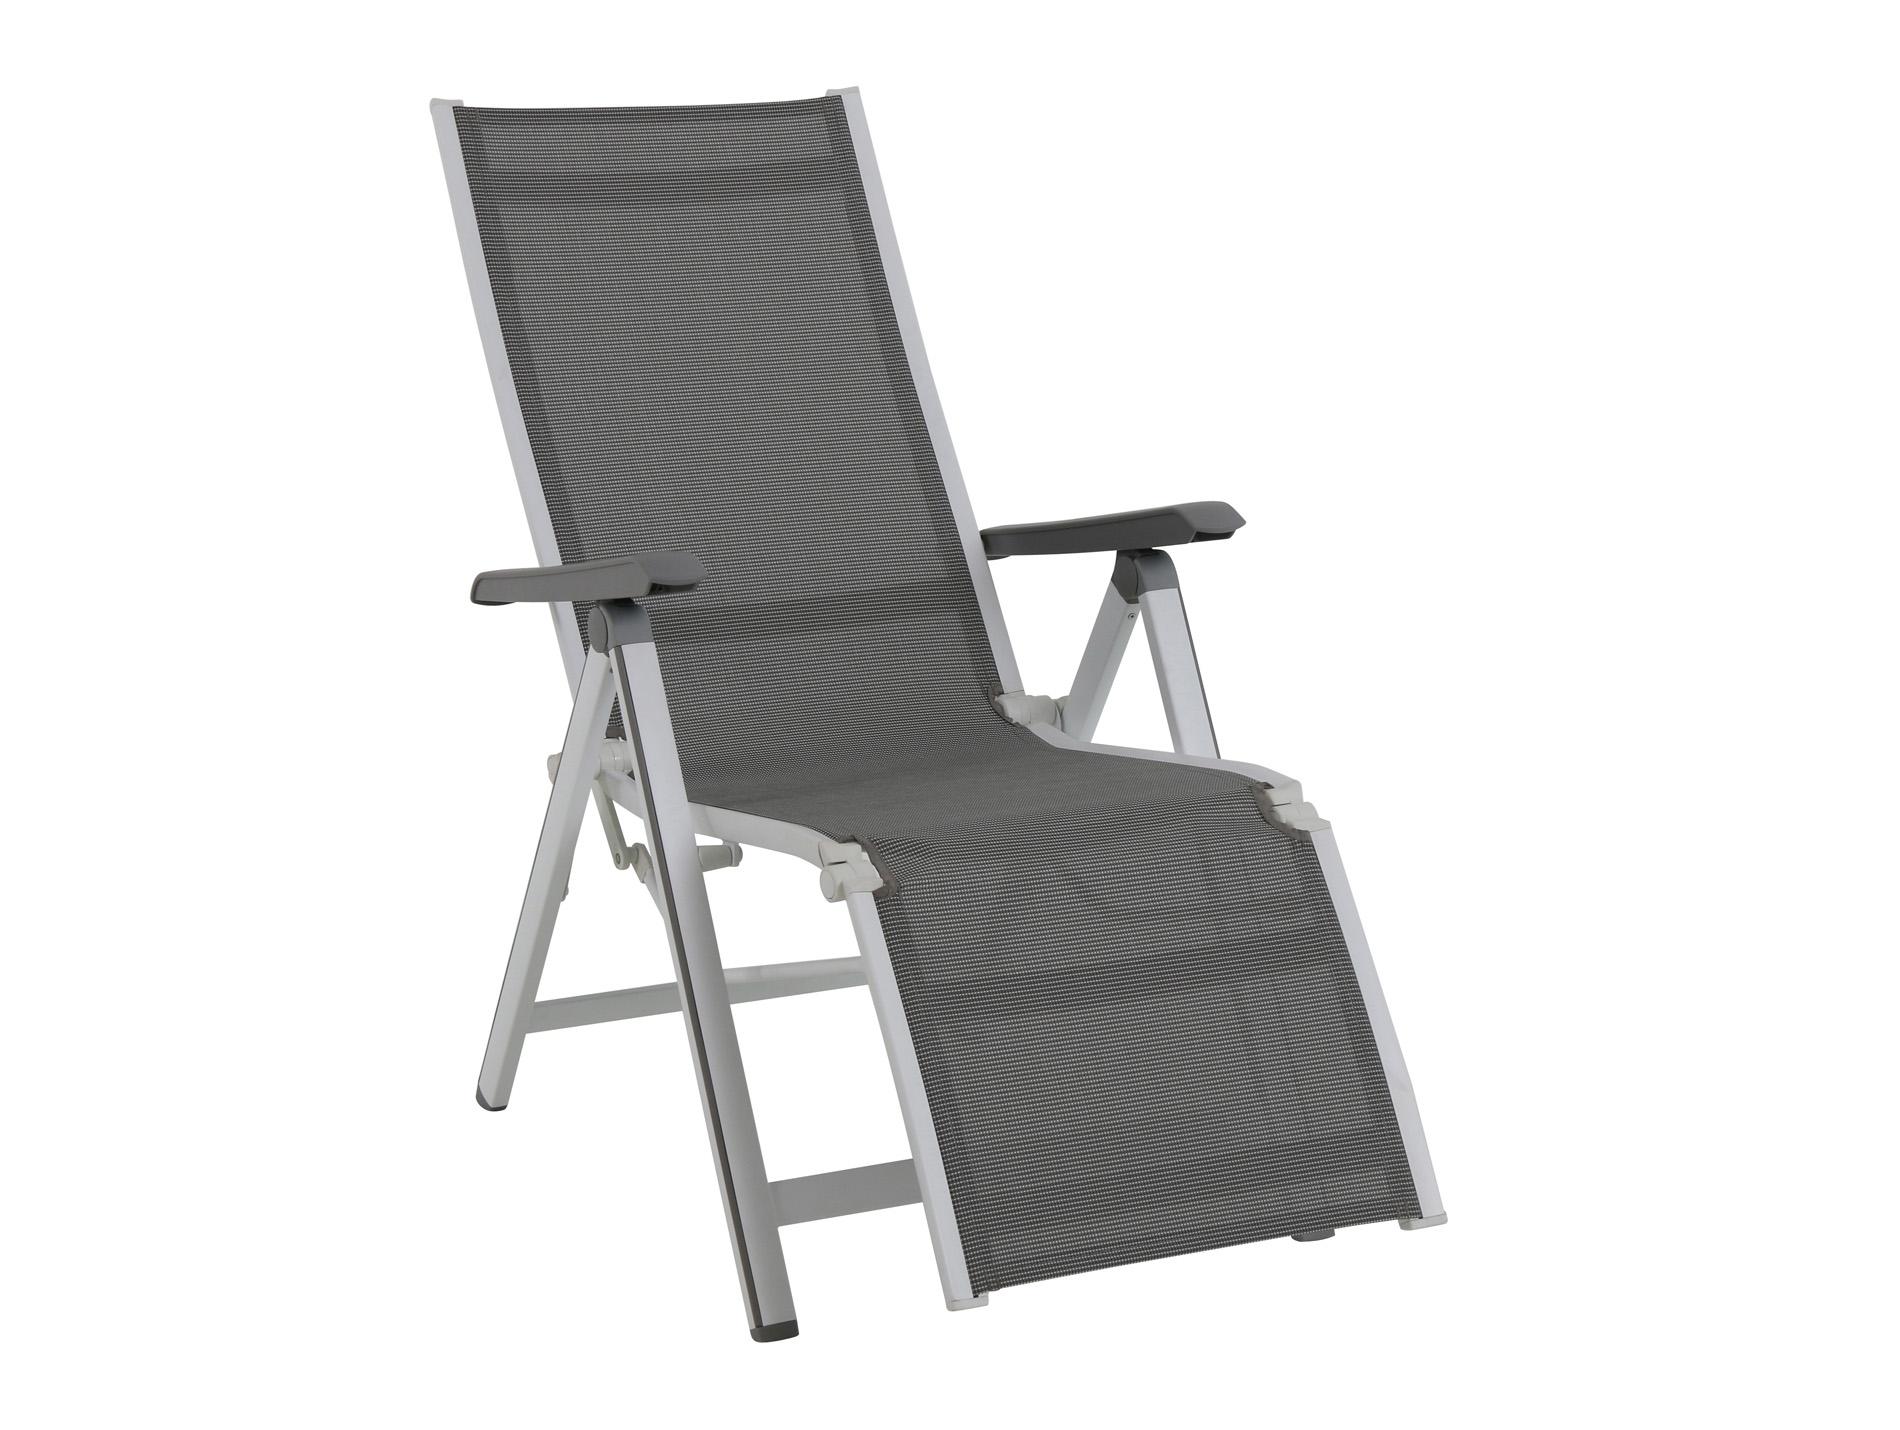 fauteuil relax aluminium anthracite mobilier de jardin. Black Bedroom Furniture Sets. Home Design Ideas